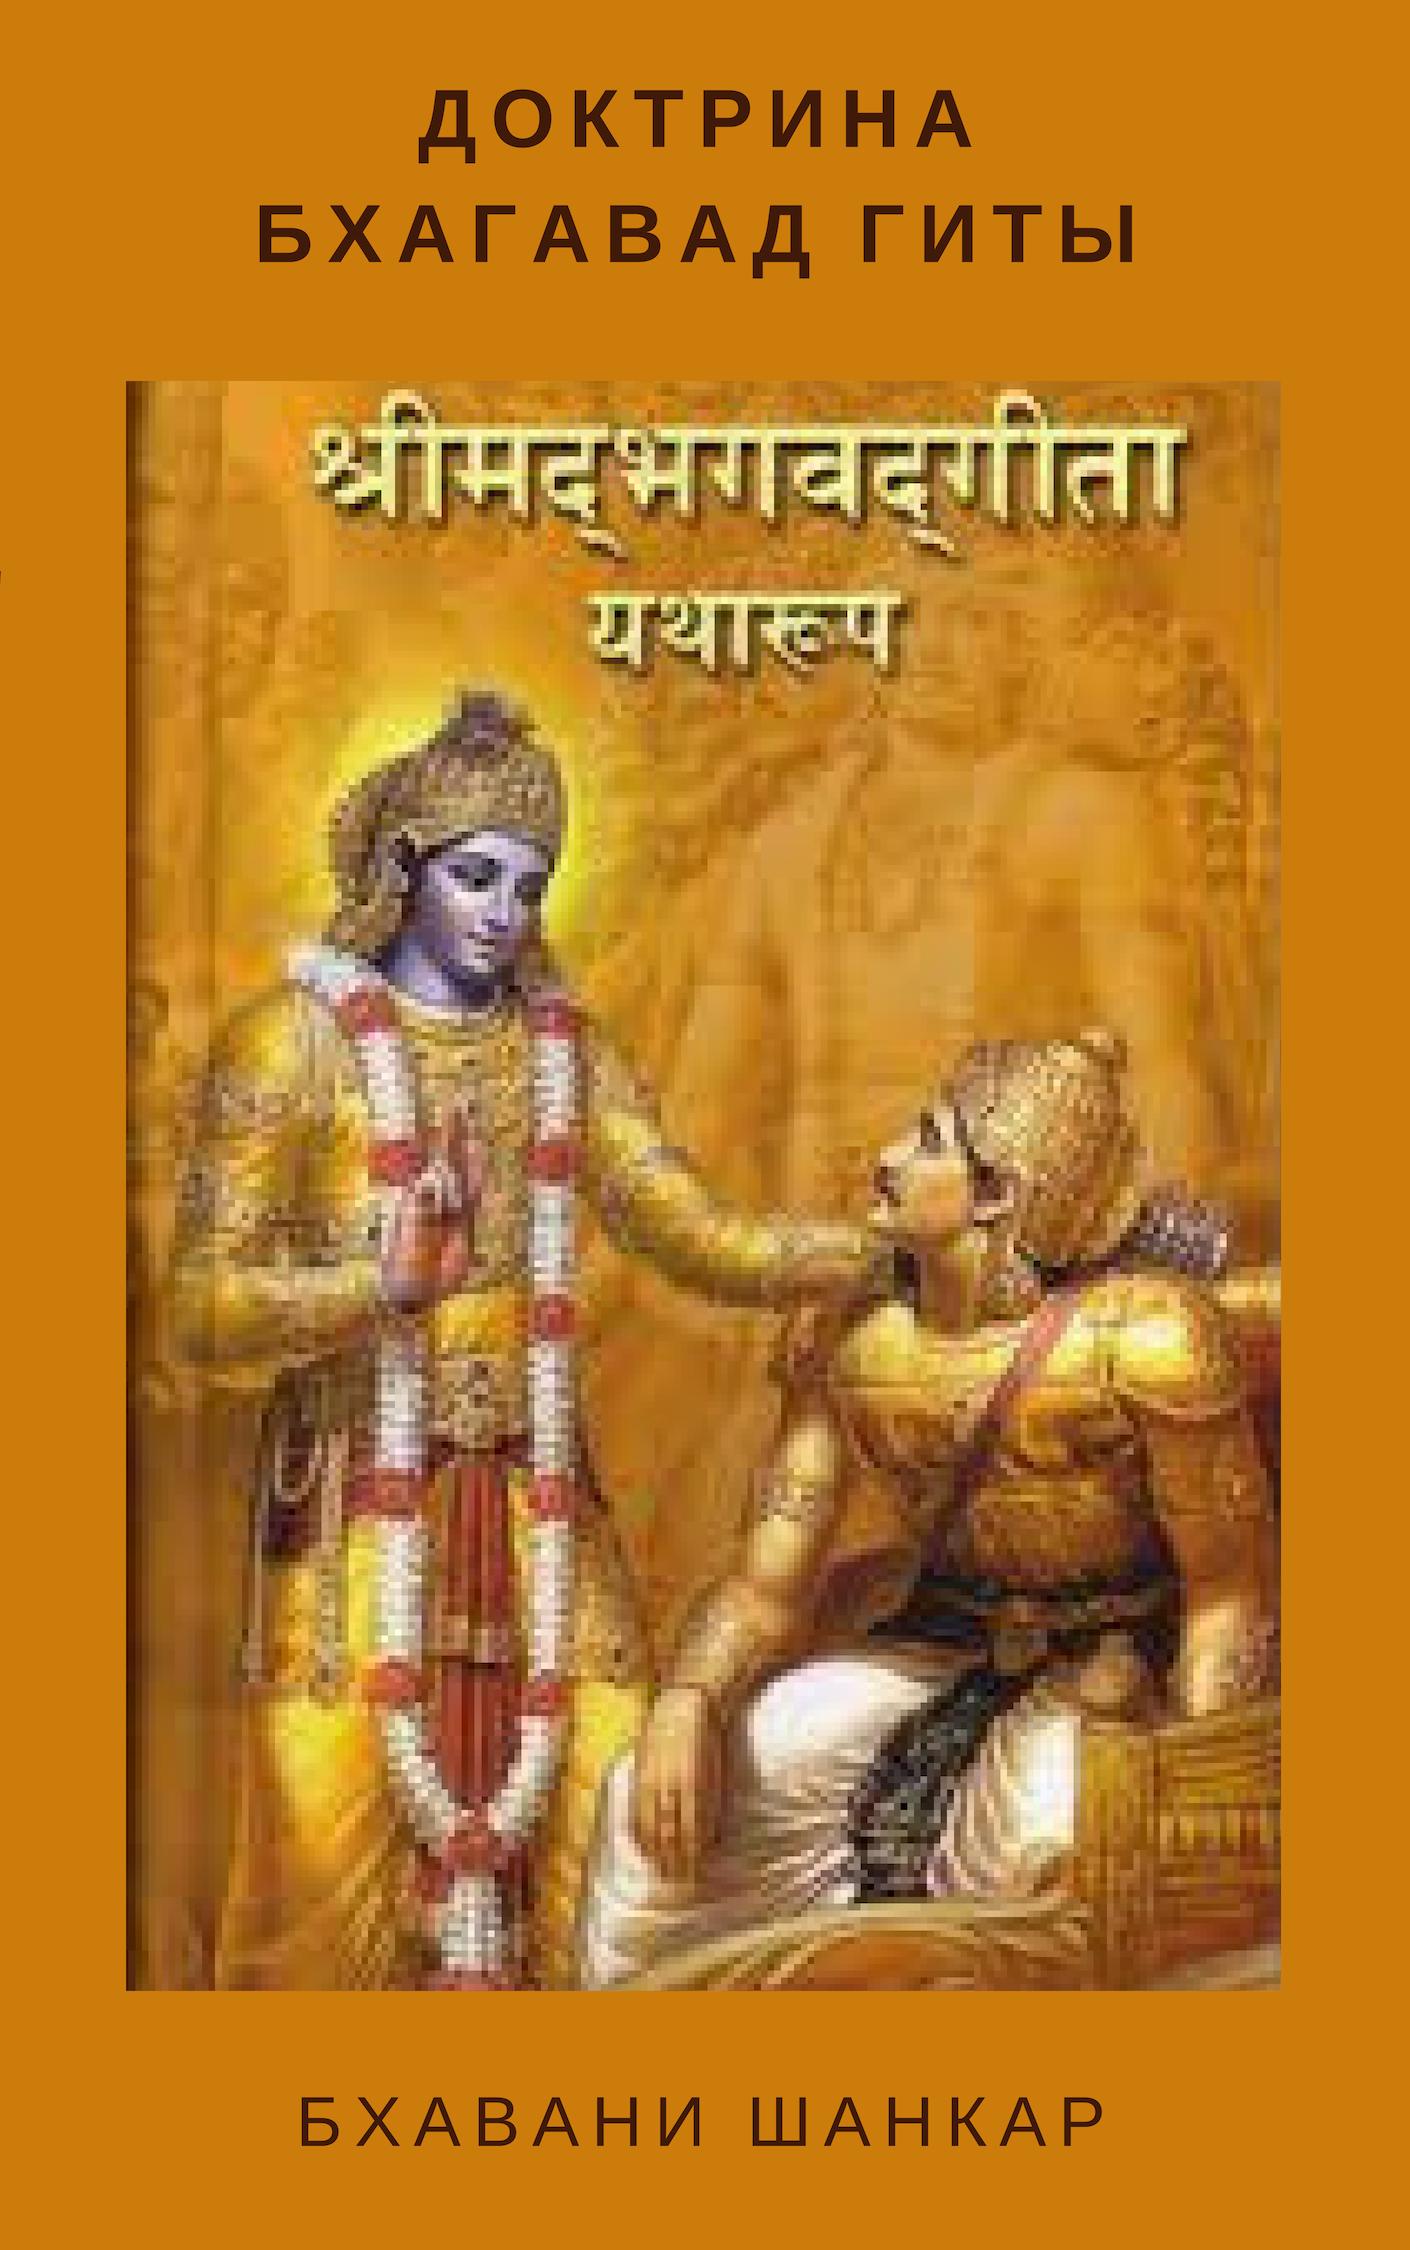 Доктрина Бхагавад Гиты Гл. 1-3 Бхавани Шанкар